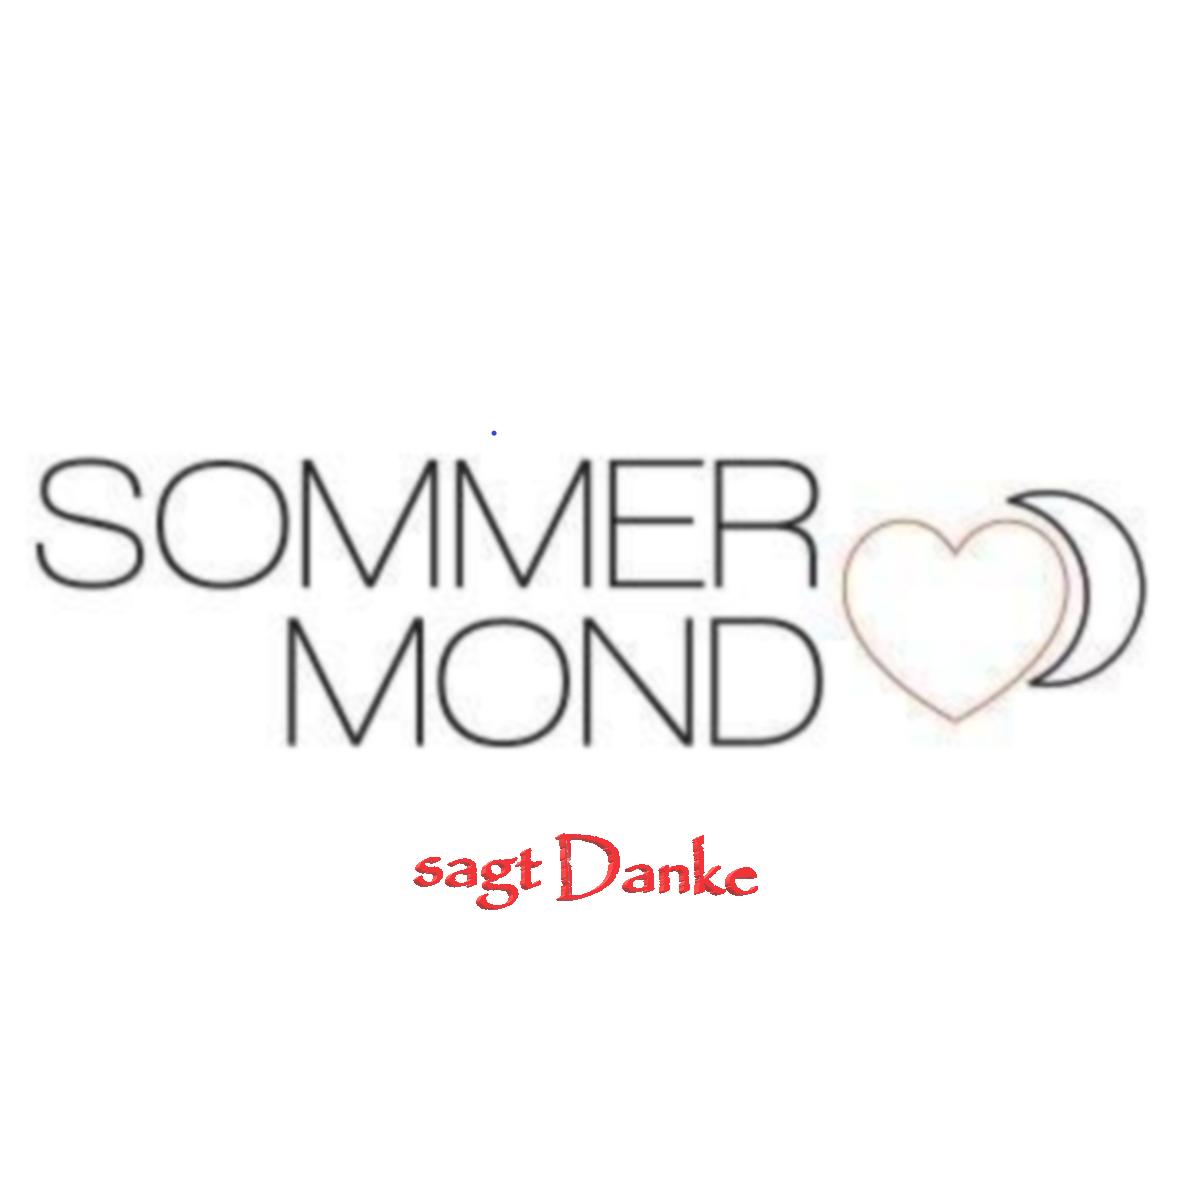 logo_spezial_0001.png